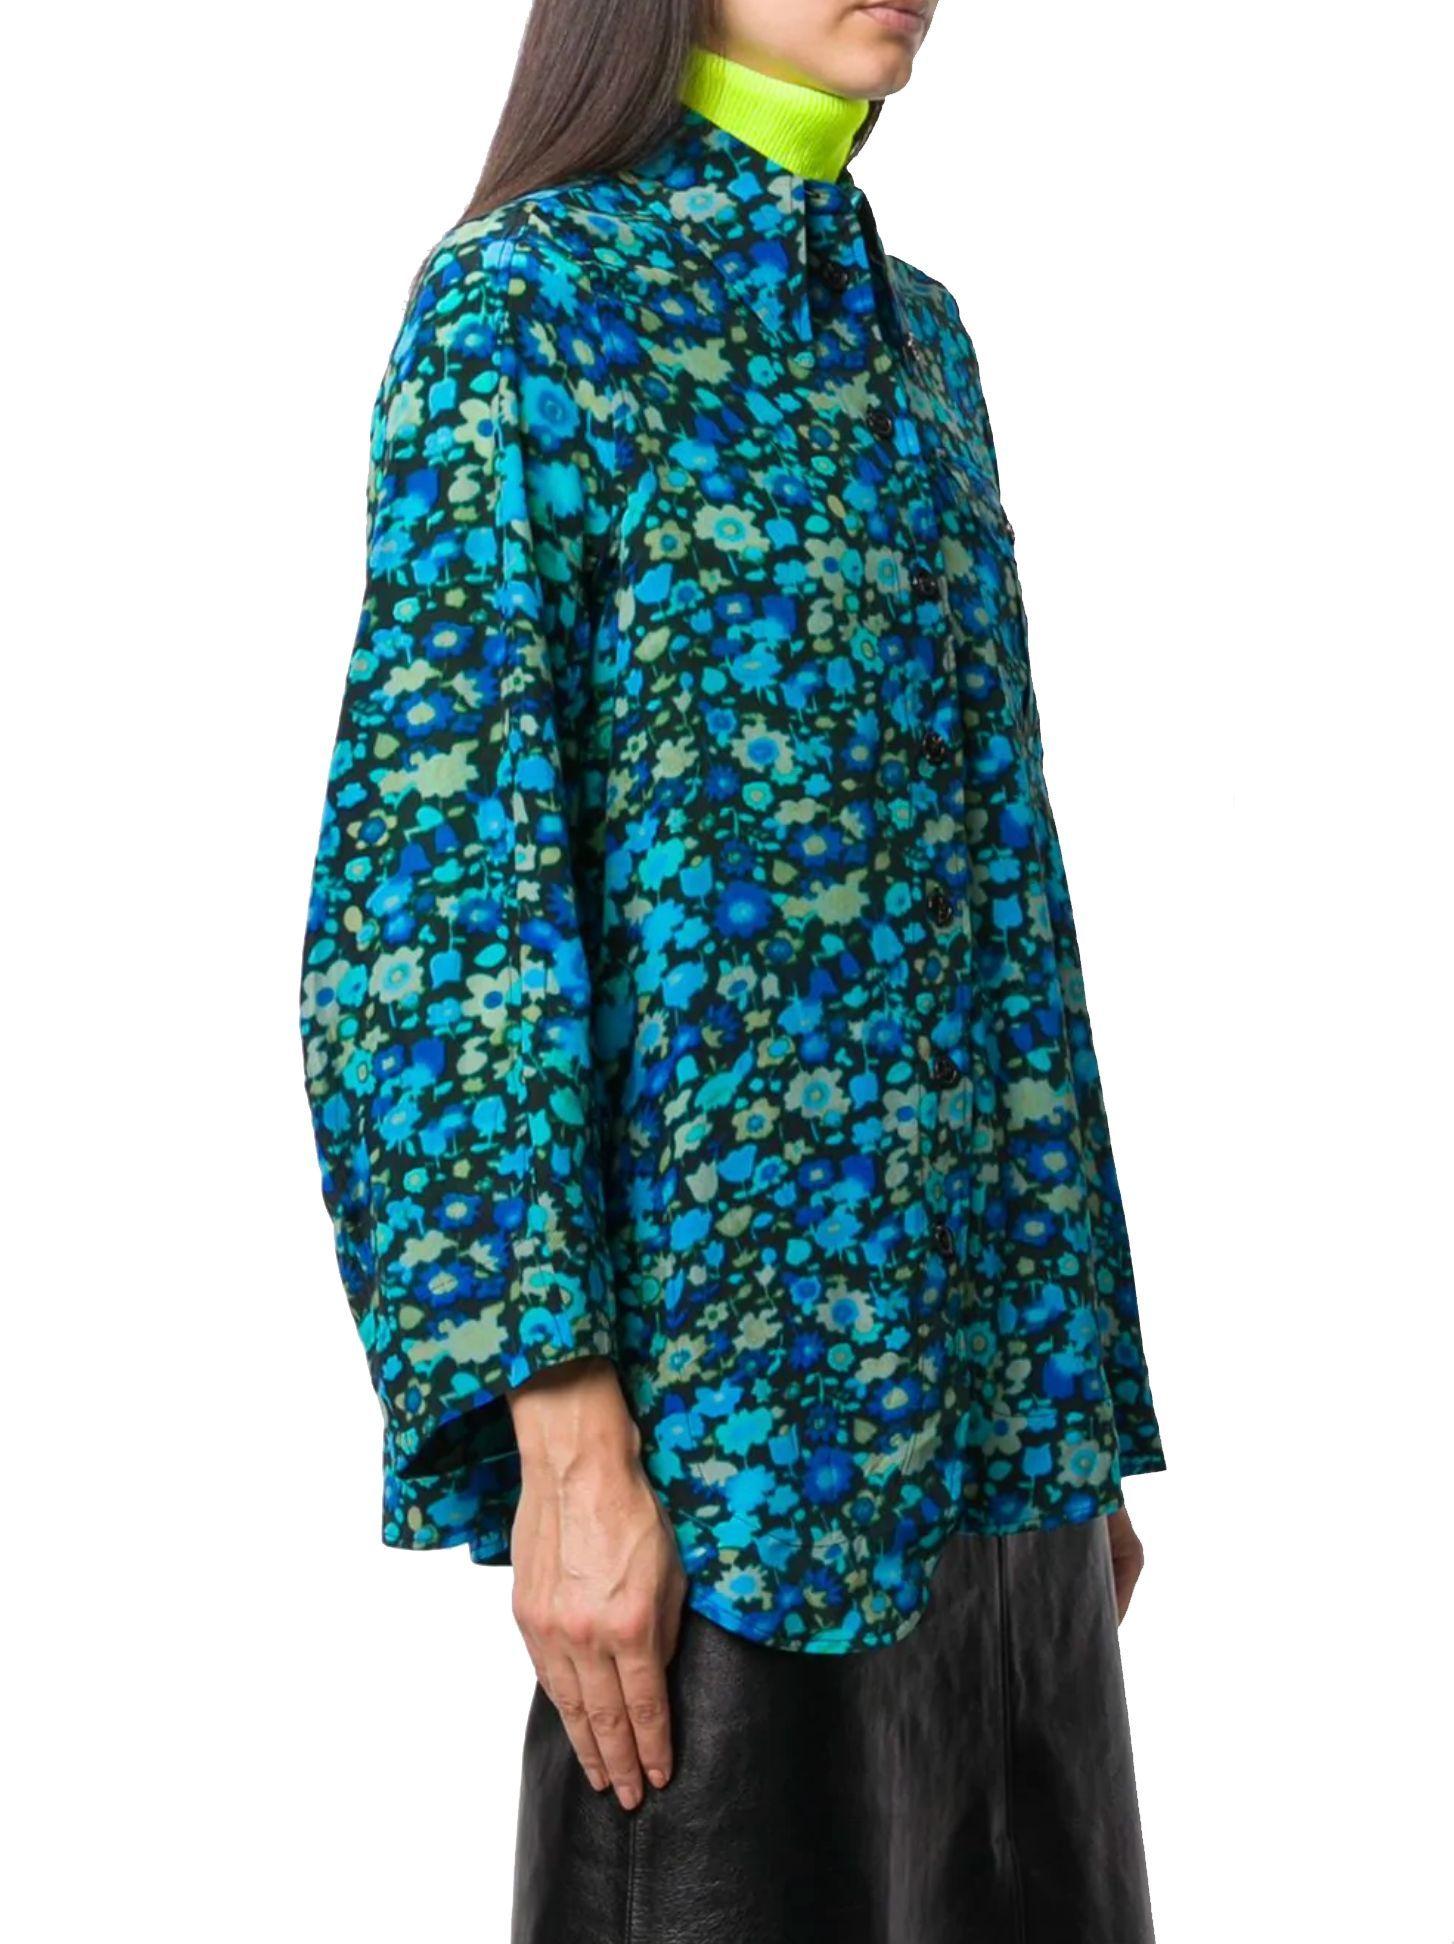 GANNI WOMEN'S F3887697 BLUE VISCOSE SHIRT